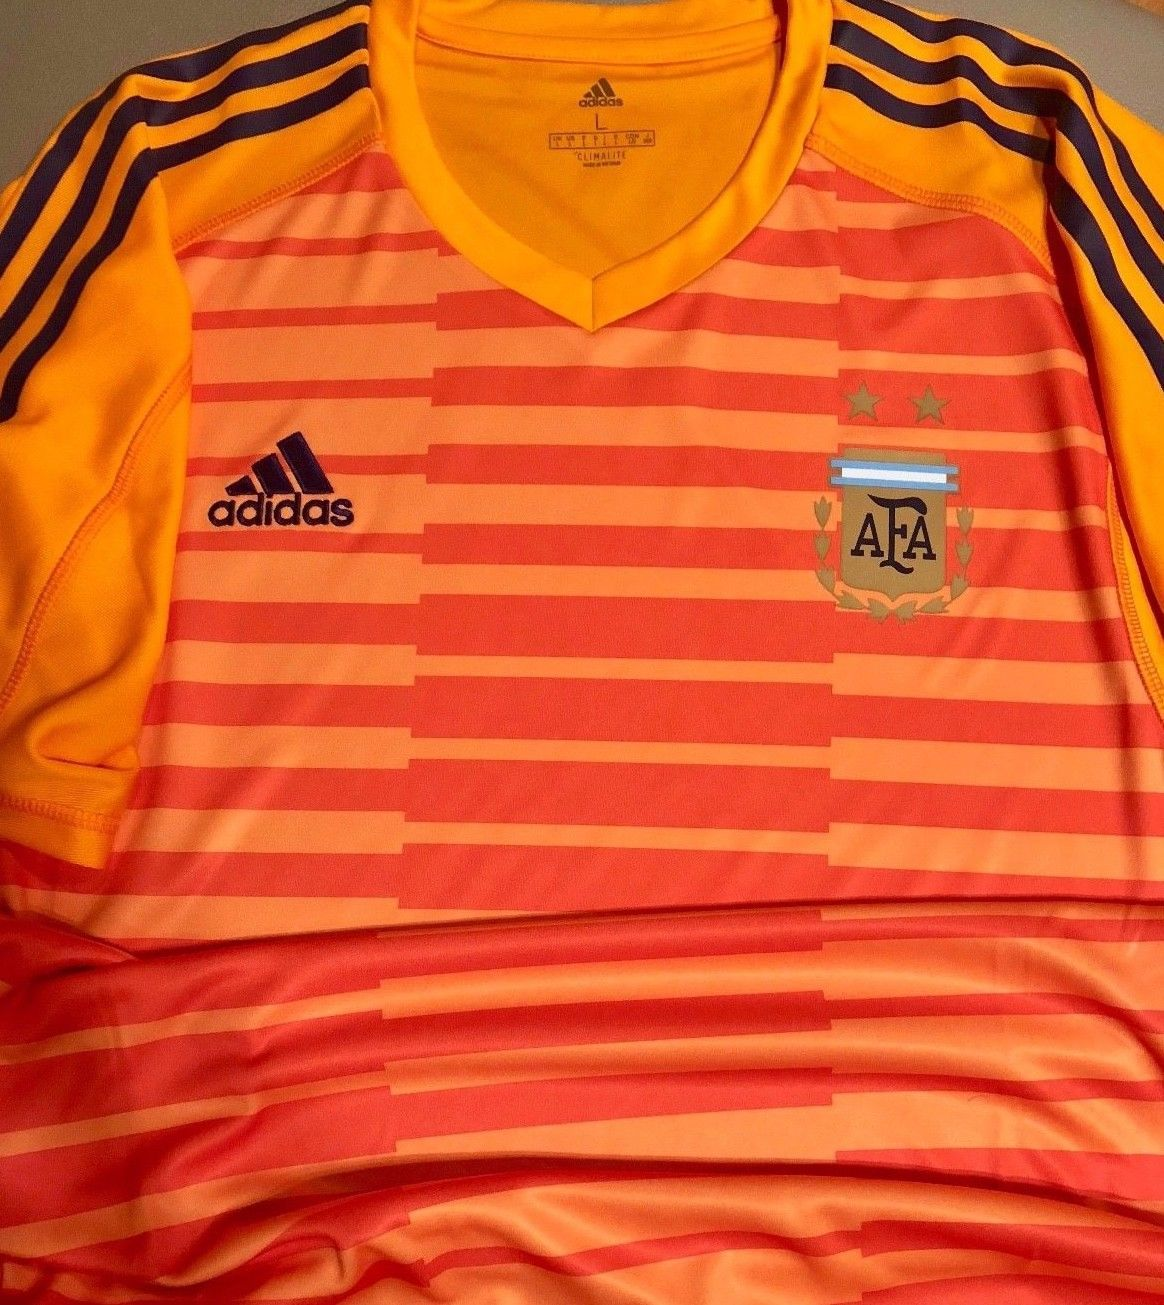 Fifa World Cup 2018 Russia Adidas Afa Argentina Xx Large 2xl Fashion Big Size T Shirt Goalkeeper Jersey Discount Price